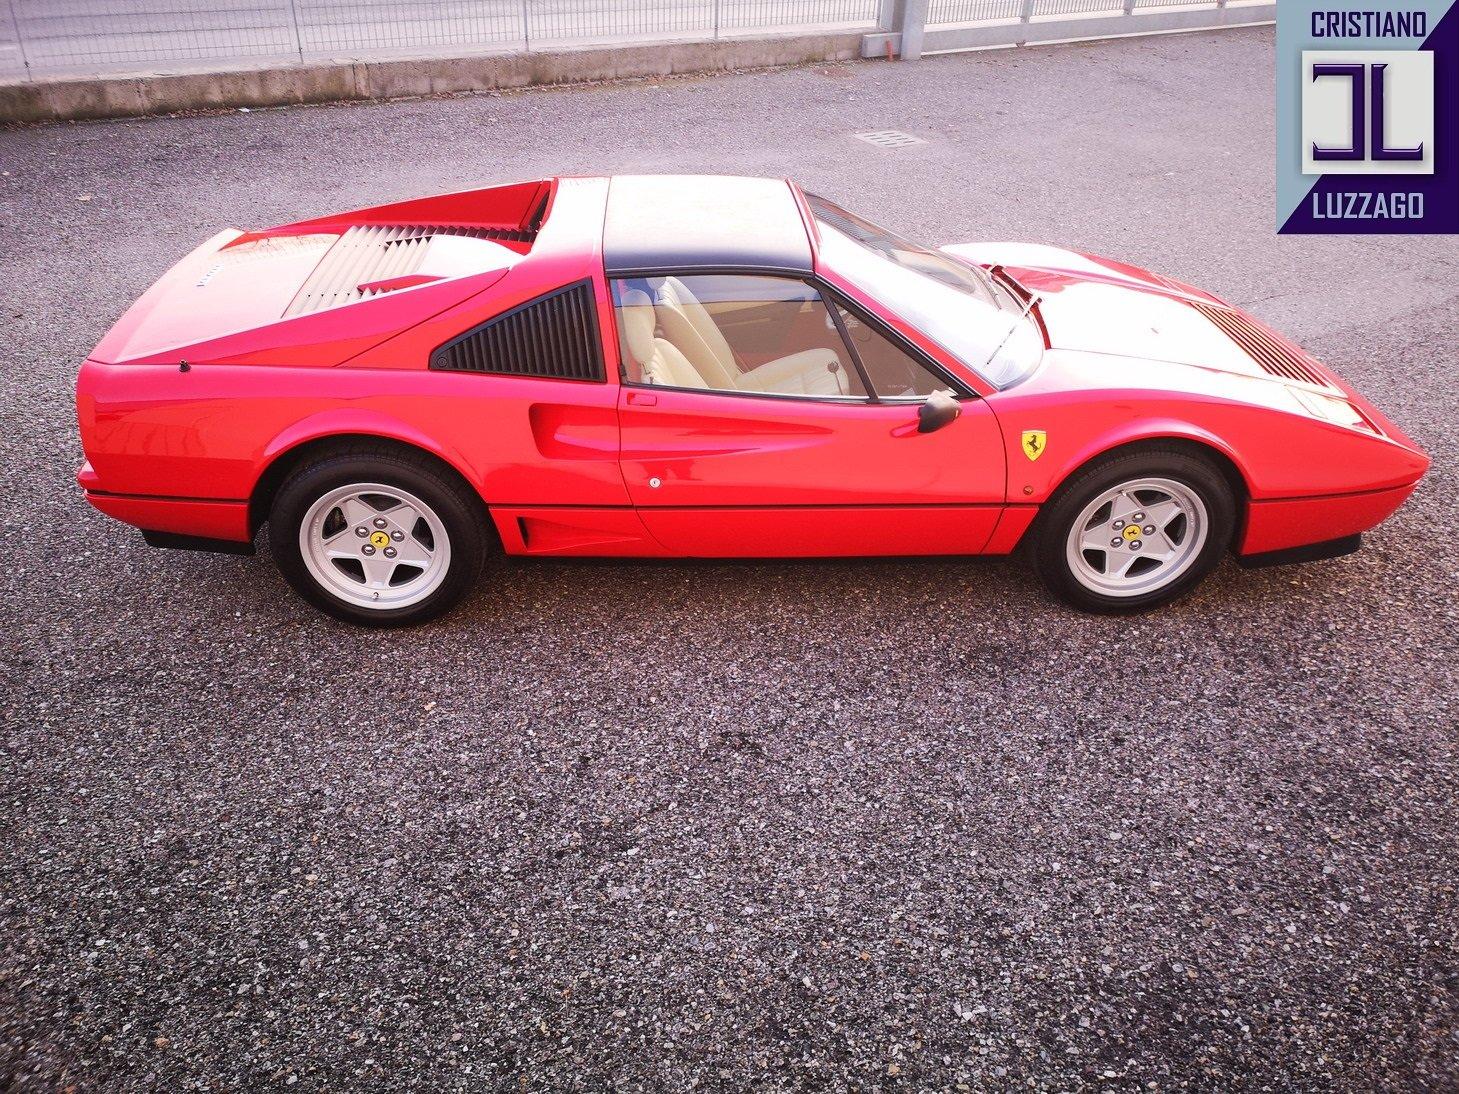 1987 FERRARI GTS TURBO INTERCOOLER For Sale (picture 3 of 6)